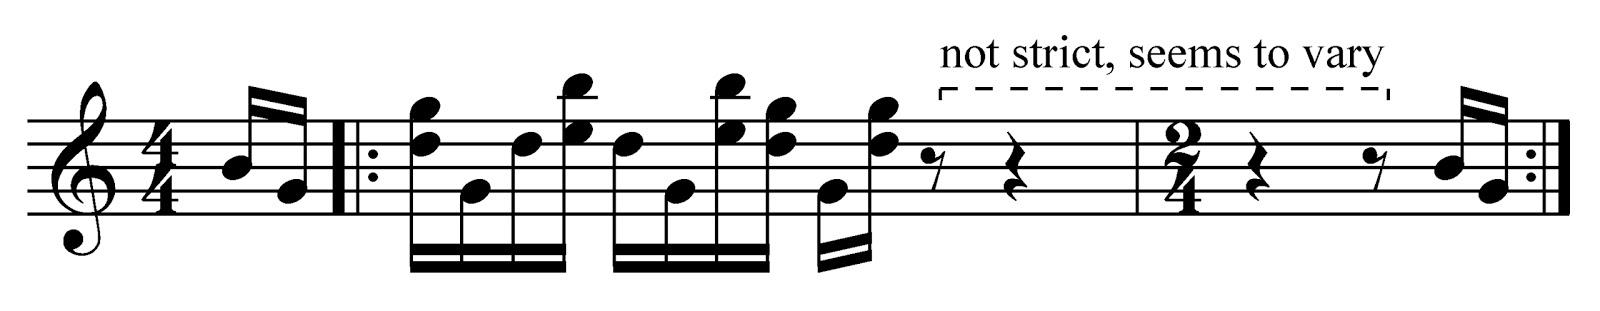 iphone marimba ringtone notes